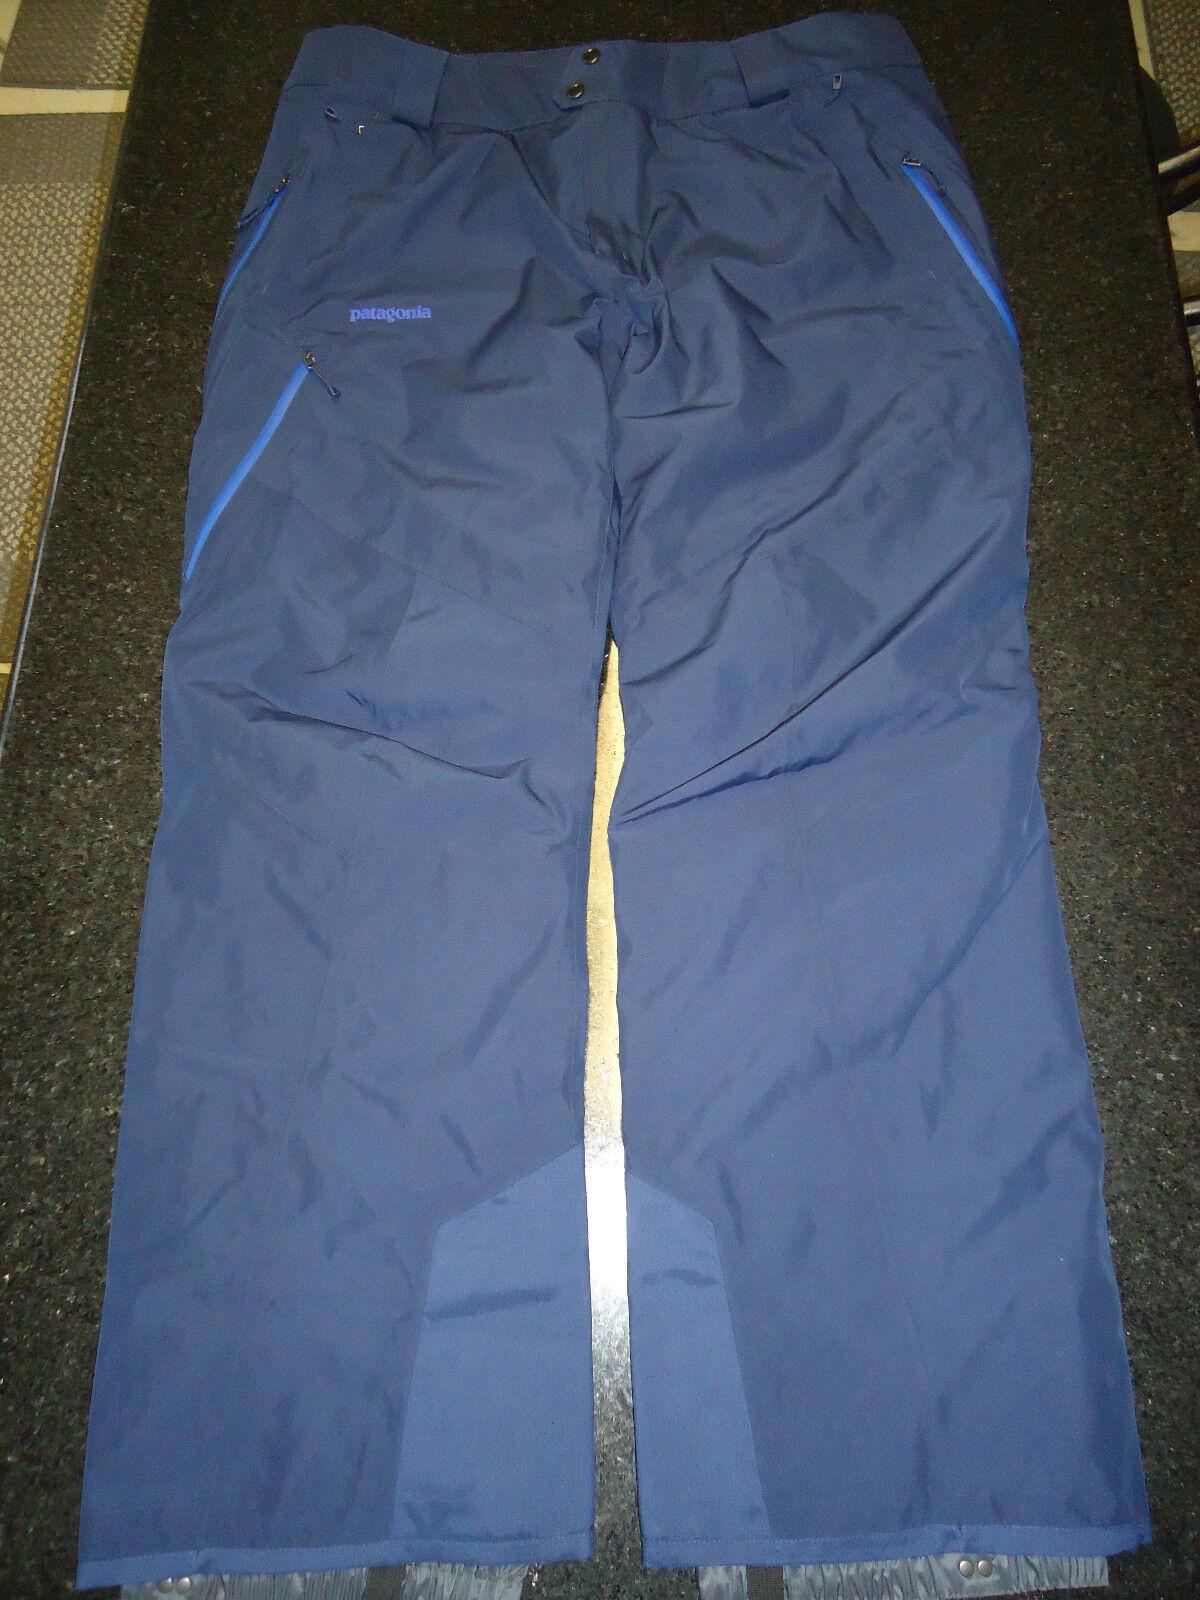 PATAGONIA POWDER BOWL INSULATED GORE-TEX PANTS MEN'S (XL) -